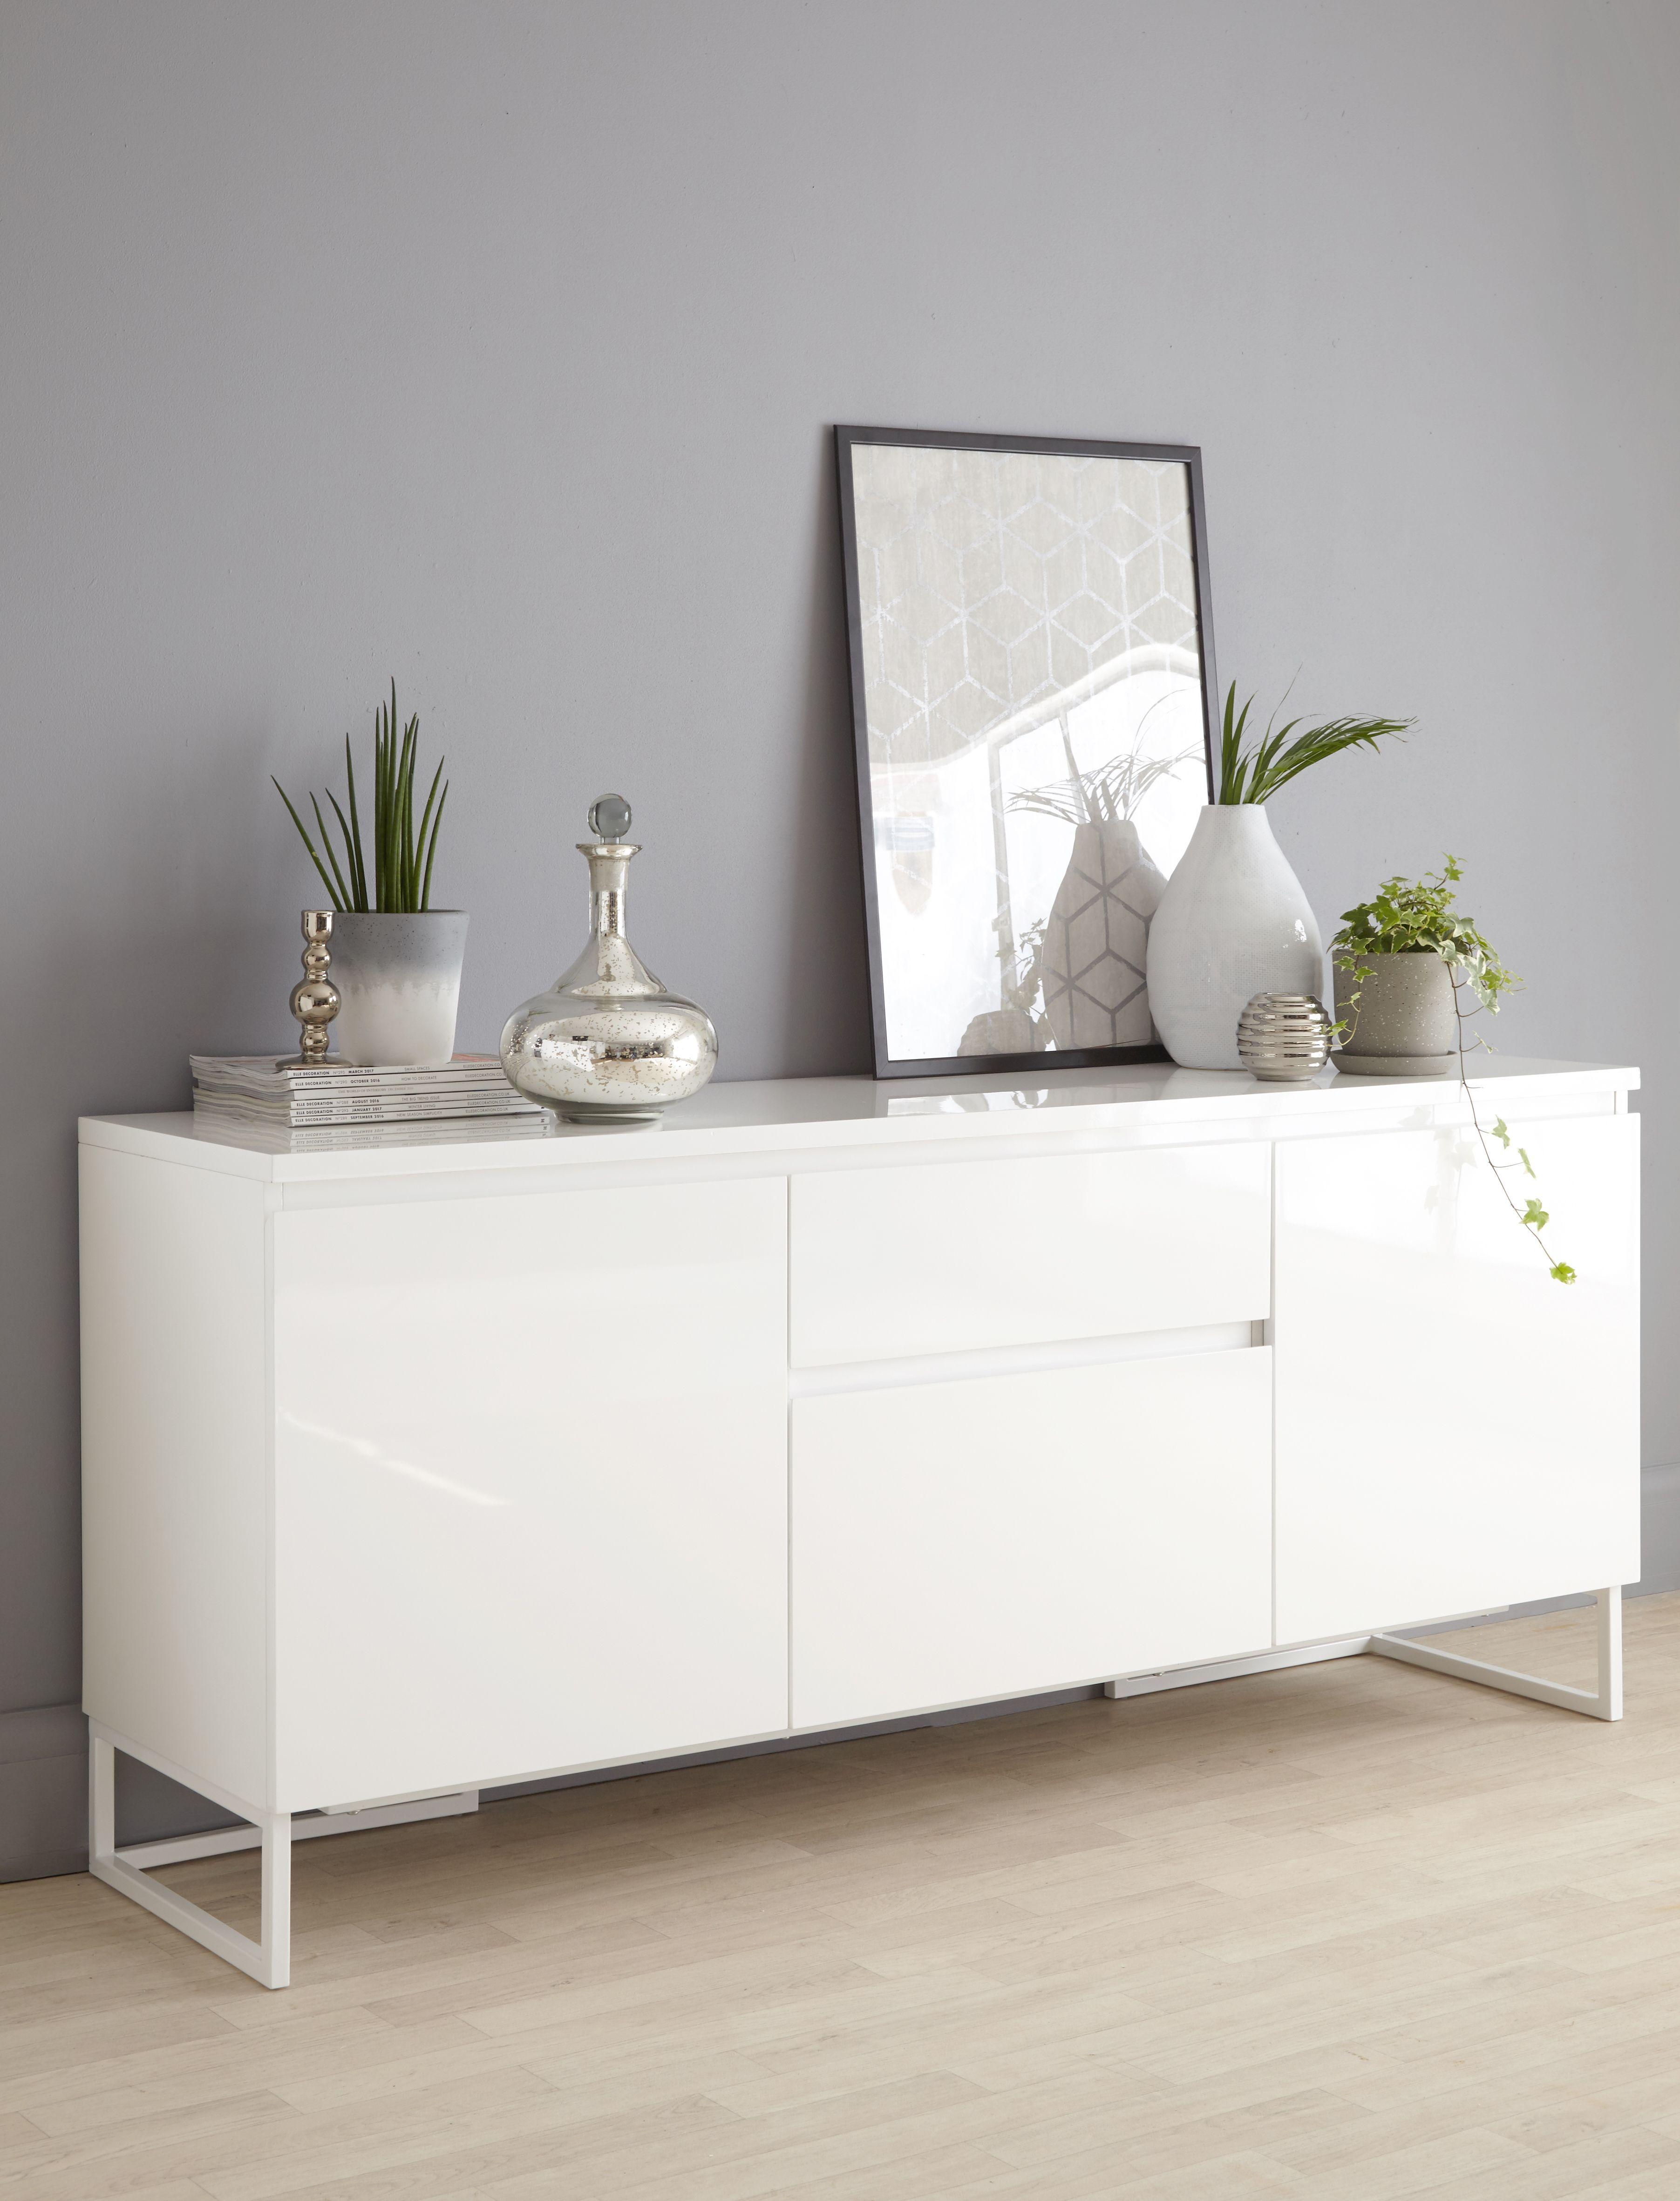 Lexi White Gloss Sideboard In 2020 Modern White Sideboard